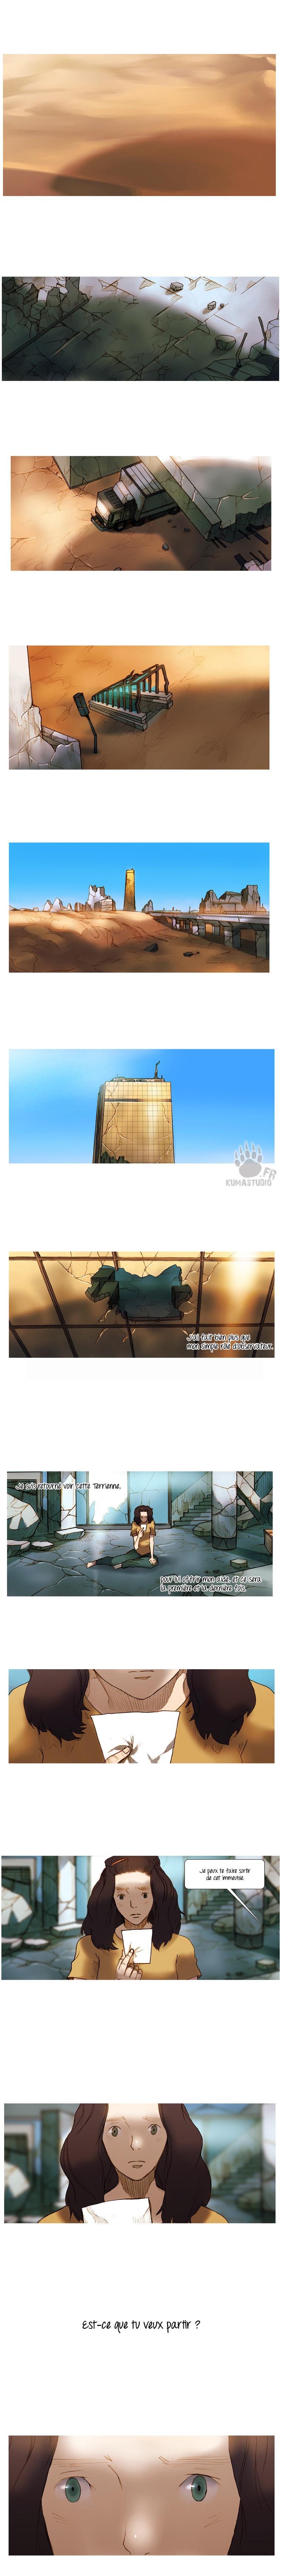 https://nine.mangadogs.com/fr_manga/pic1/5/1989/73996/Noru18VF_0_11.jpg Page 1